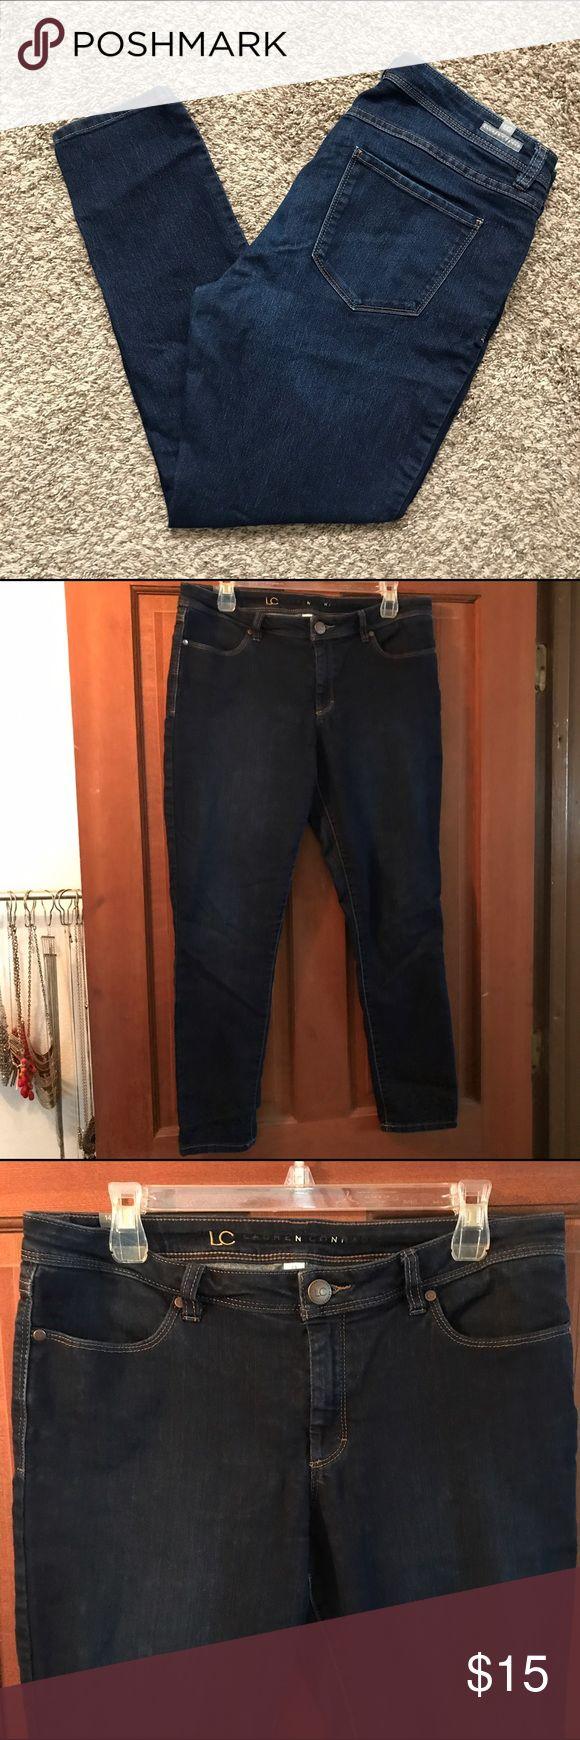 LC Lauren Conrad Jeans Dark wash skinny jeans from LC Lauren Conrad. LC Lauren Conrad Jeans Skinny